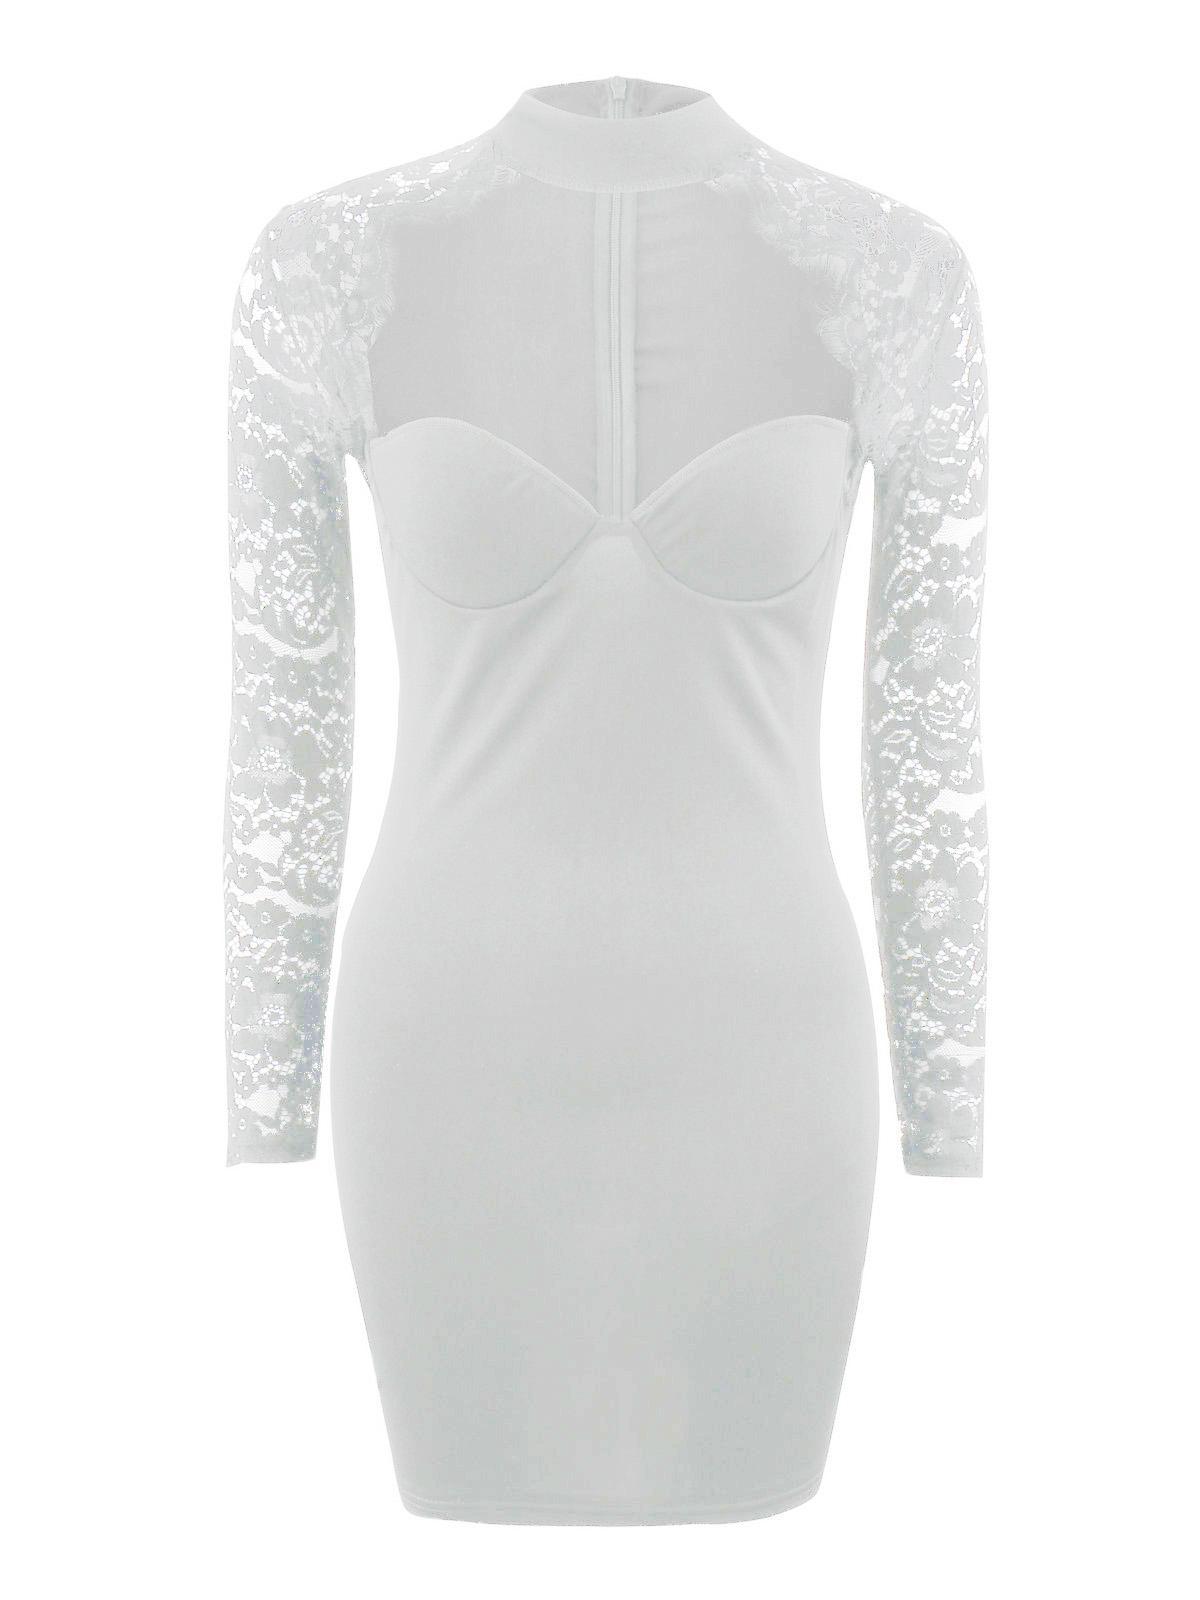 Summer New Sexy Women Lace Dress Long Sleeve Bodycon High Neck Mini Dress Elegant Female Evening Party Clubwear Slim Dresses